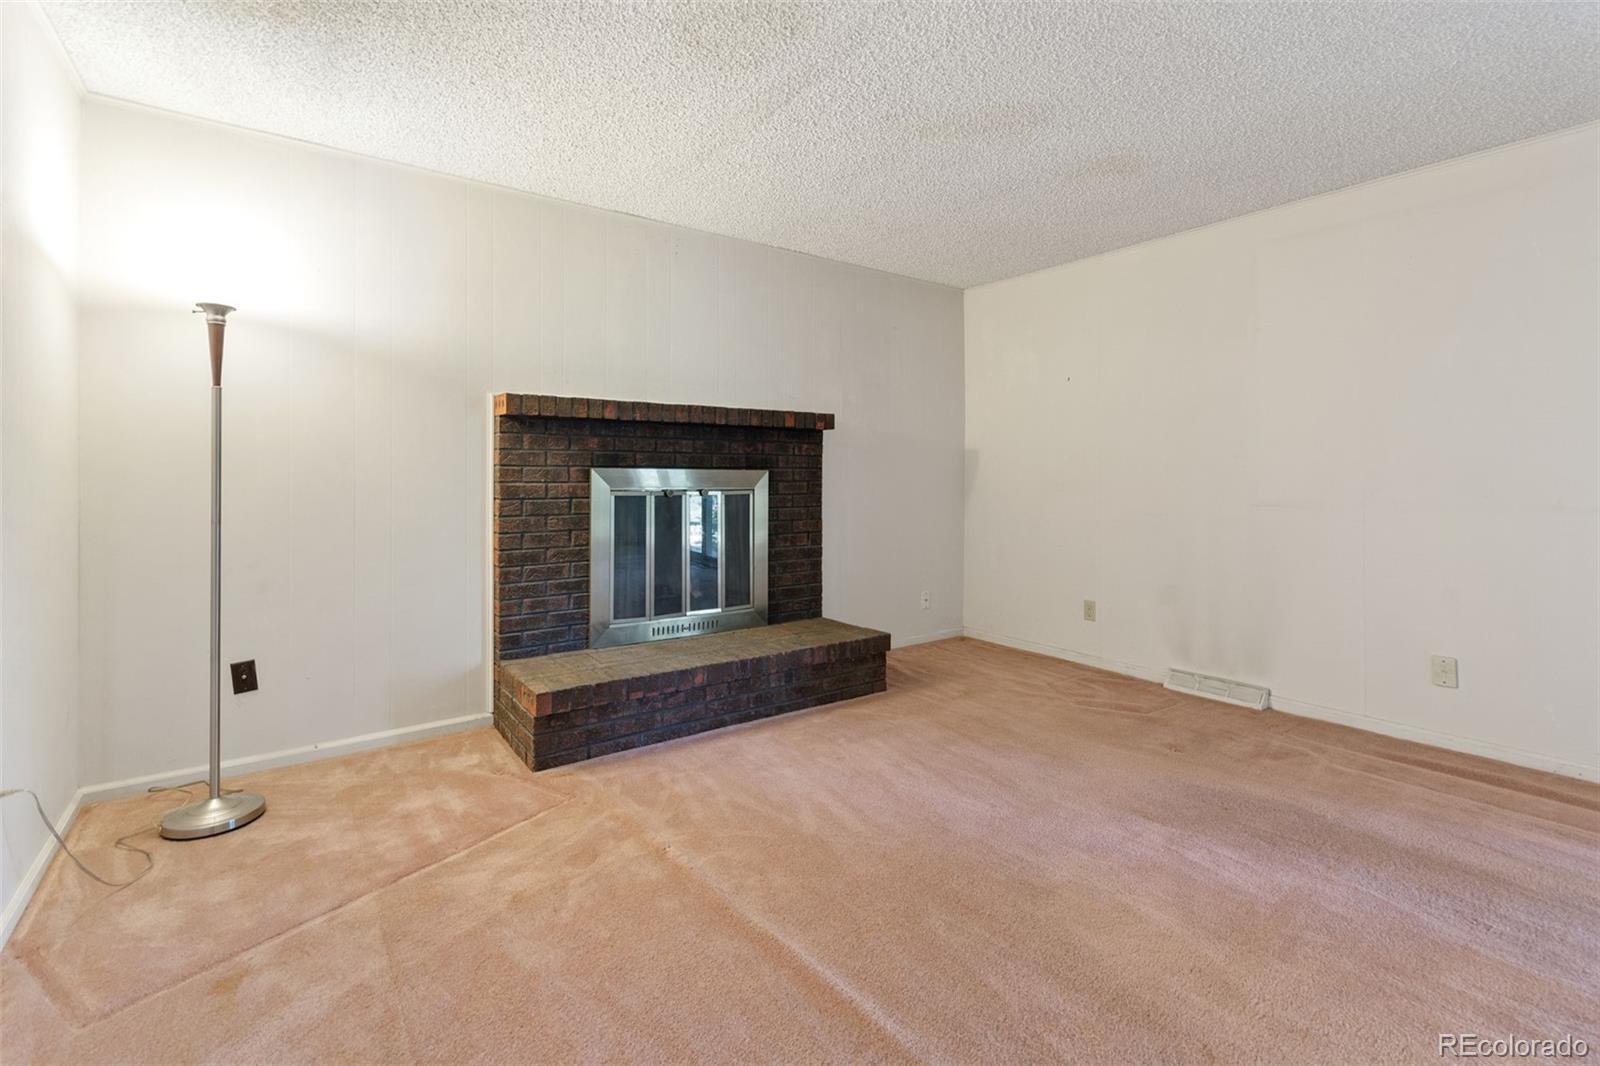 MLS# 7770404 - 16 - 2355 S Hoyt Street, Lakewood, CO 80227